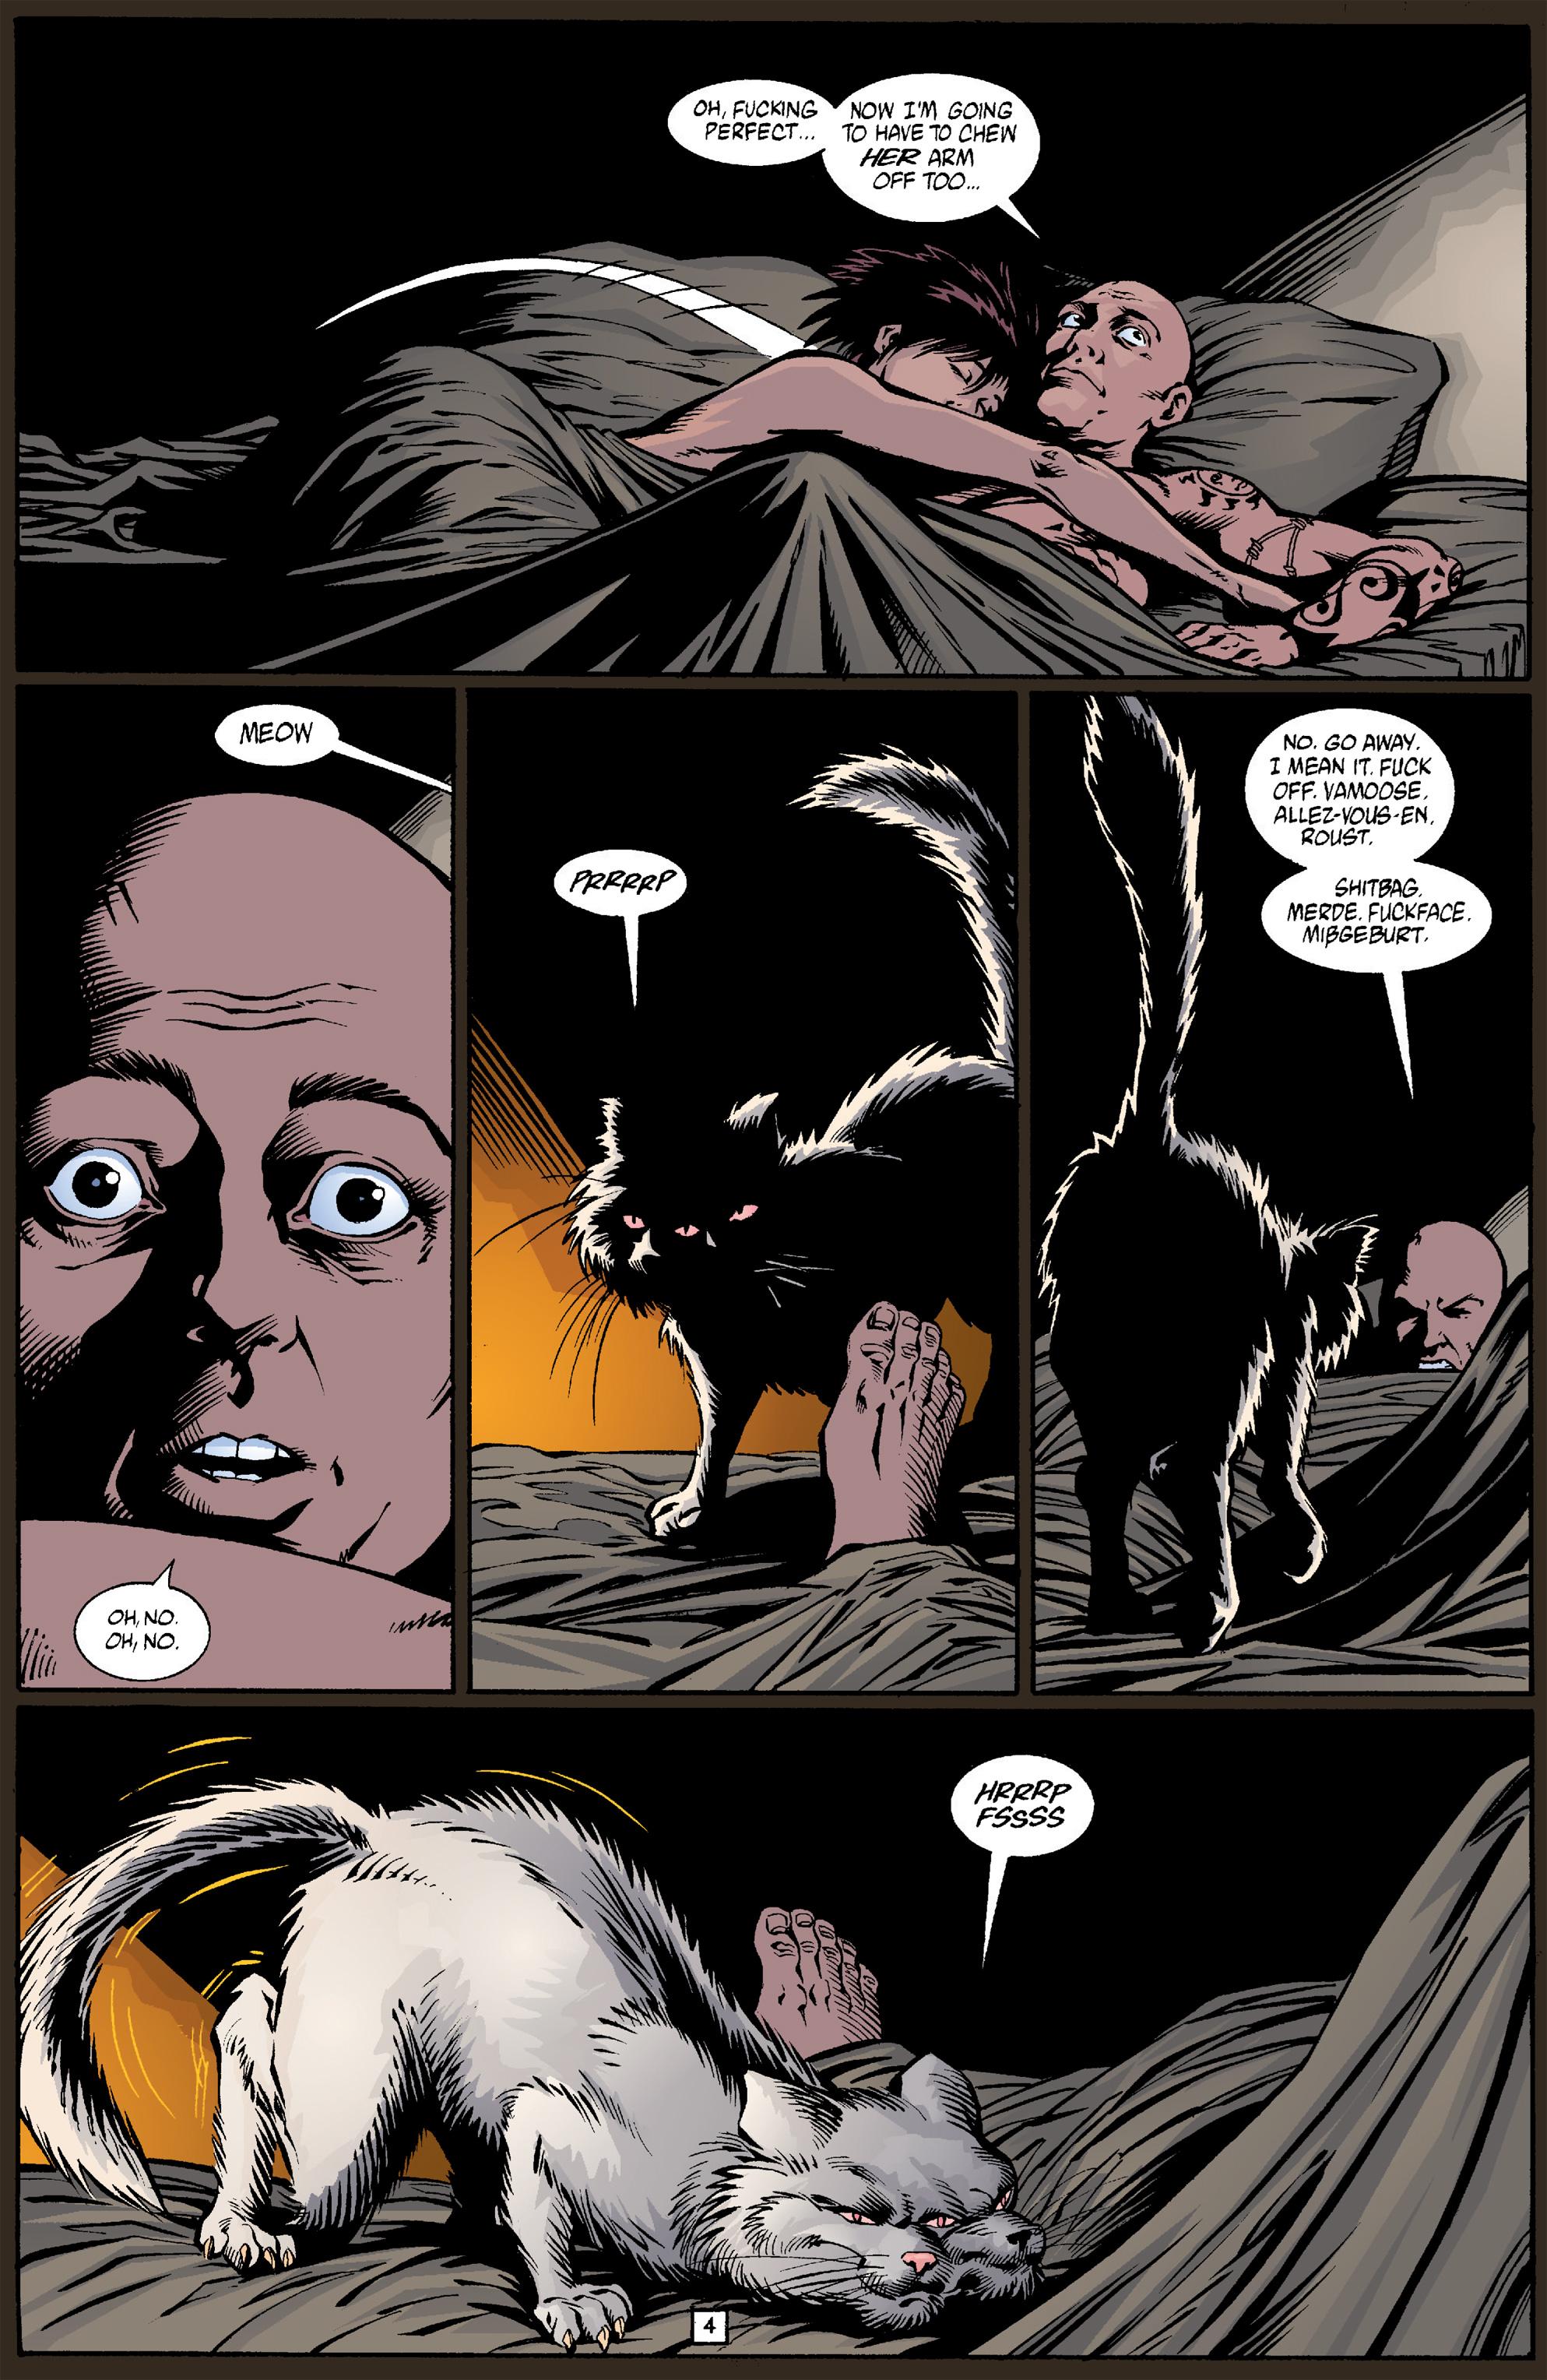 Read online Transmetropolitan comic -  Issue #17 - 5